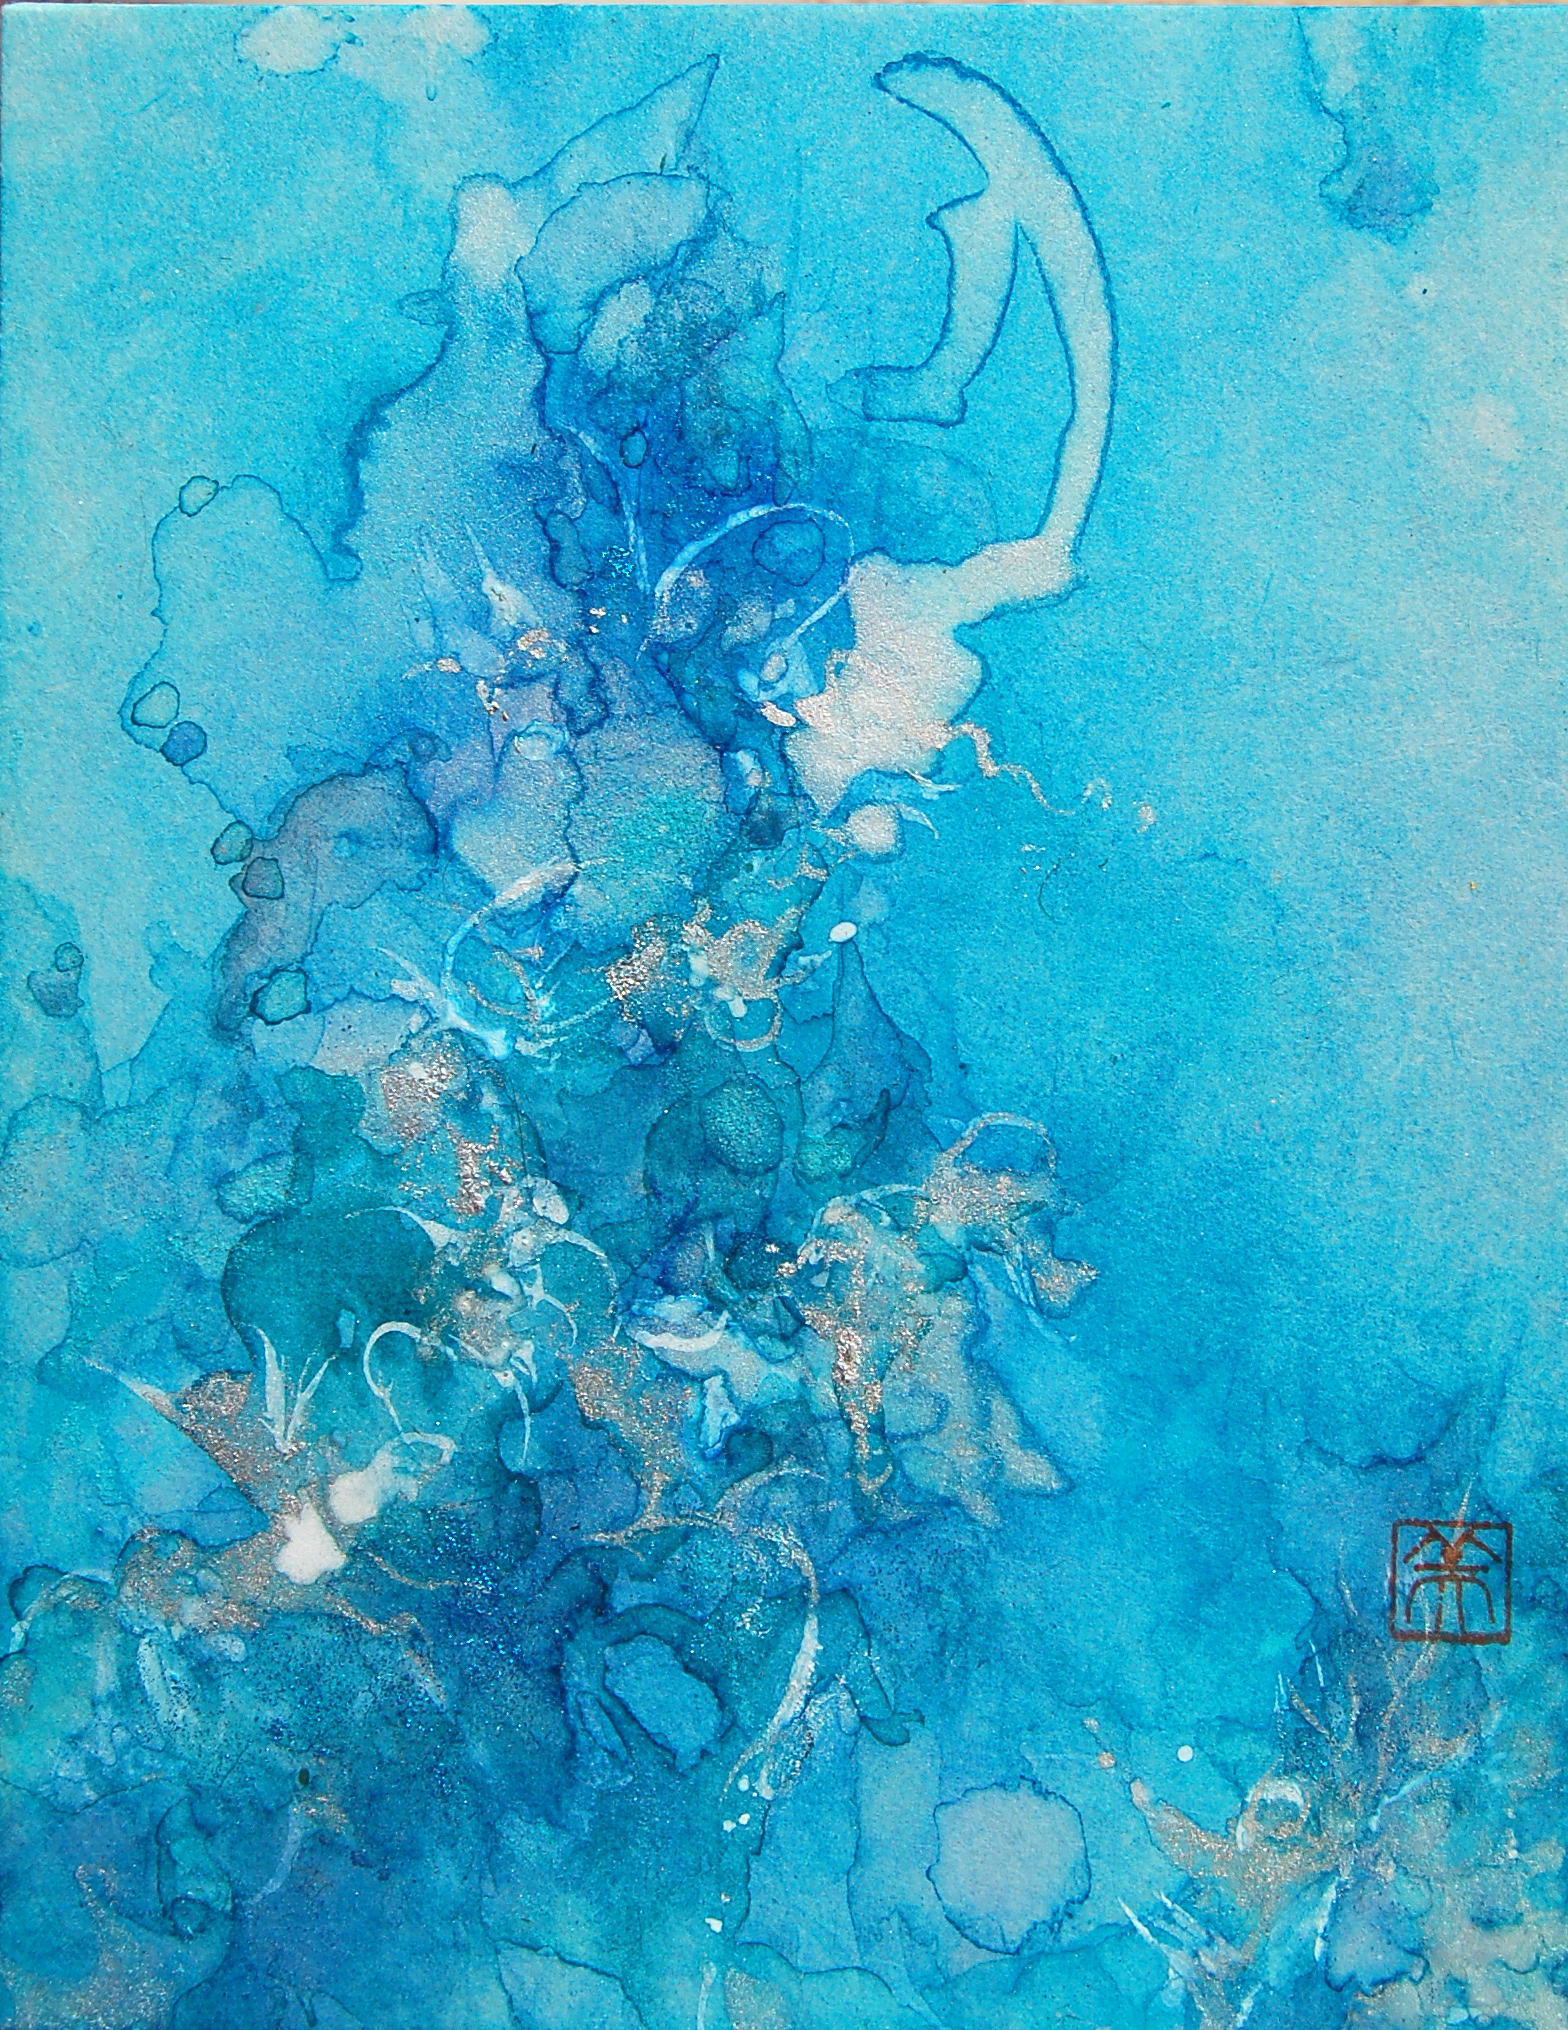 """LIFE XLVIII (48) - BLUE"""